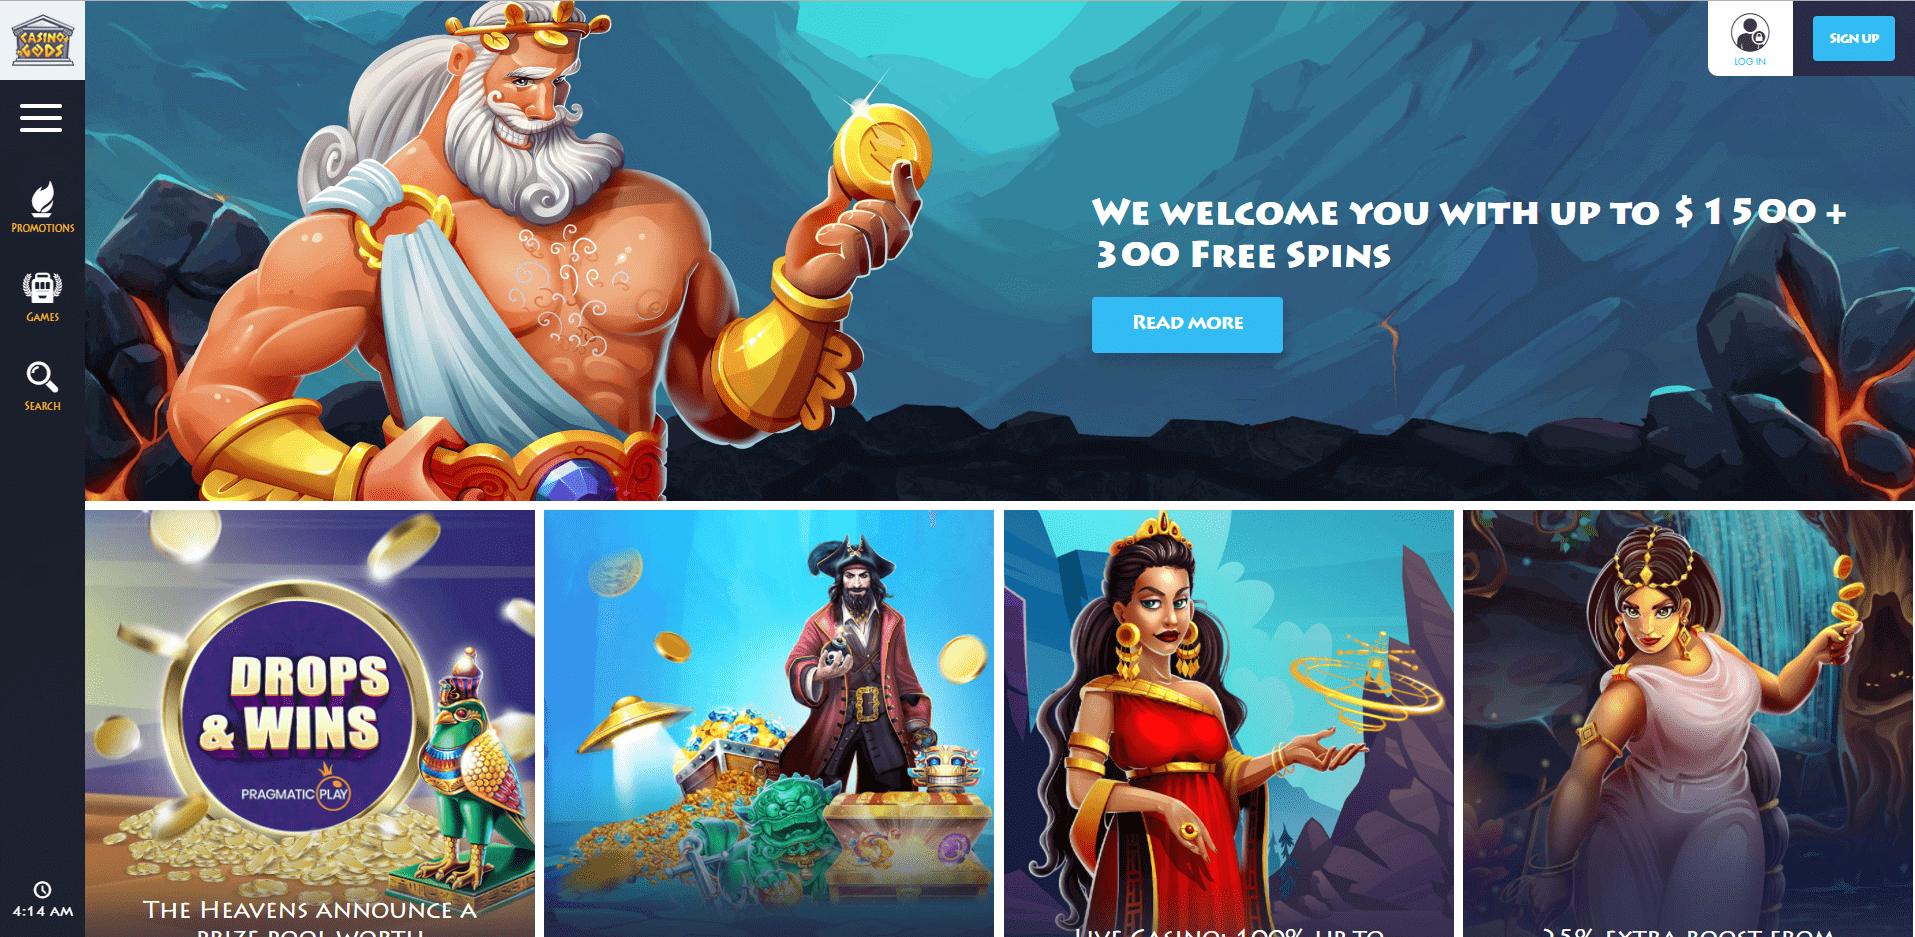 CasinoGods promo desktop